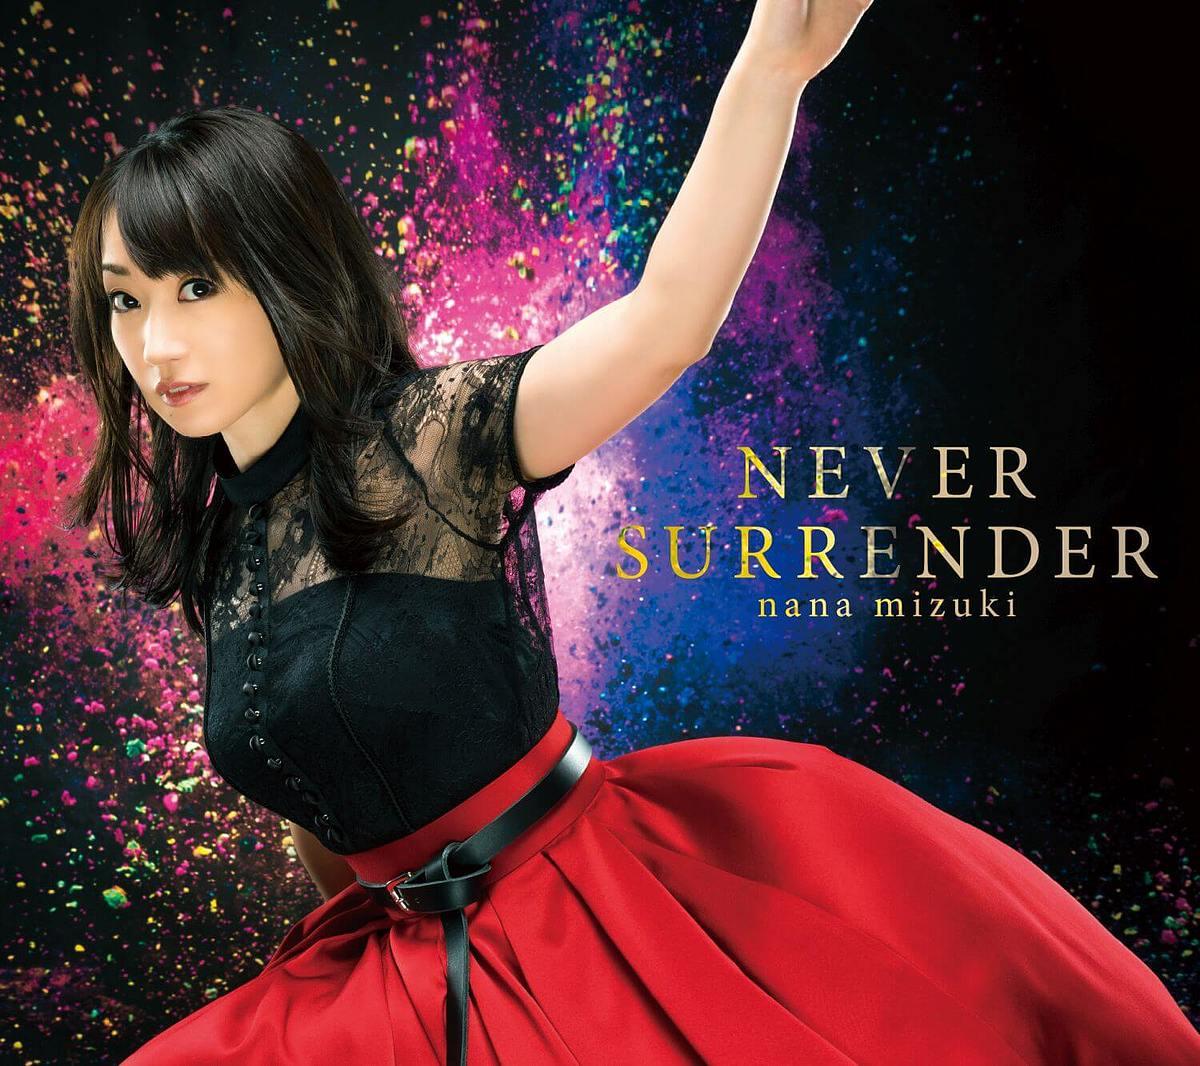 〔予約〕NEVER SURRENDER/水樹奈々【1000円以上送料無料】